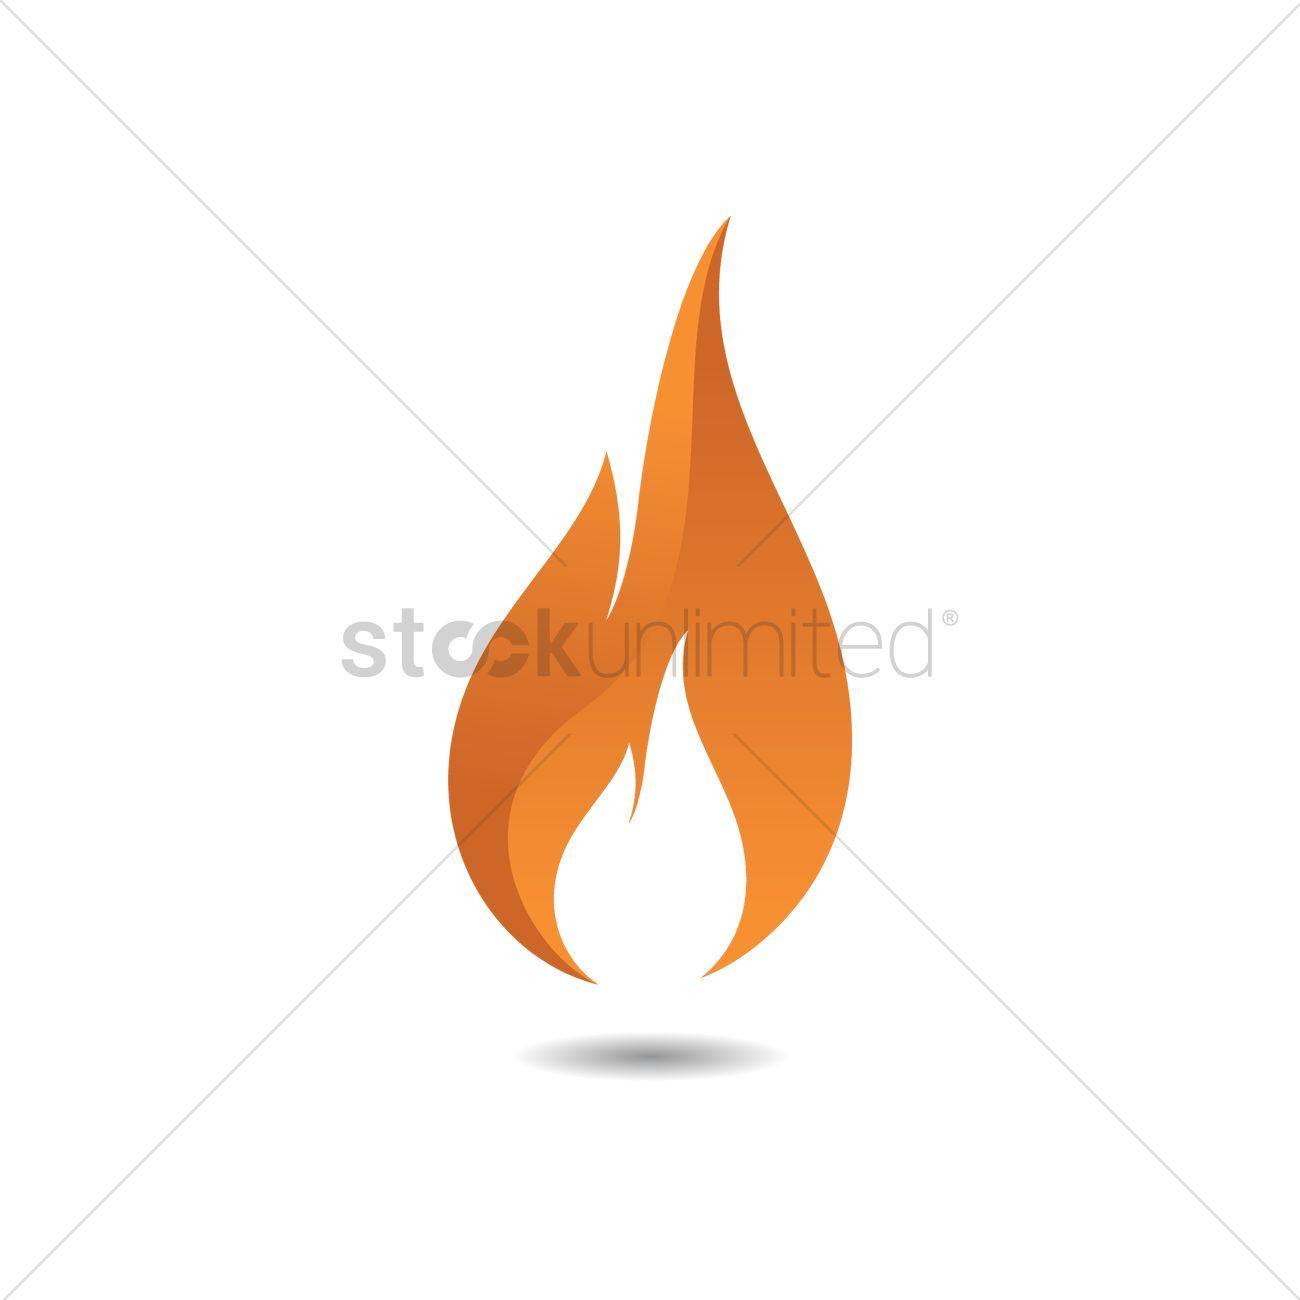 flame logo design vector image 1477186 stockunlimited